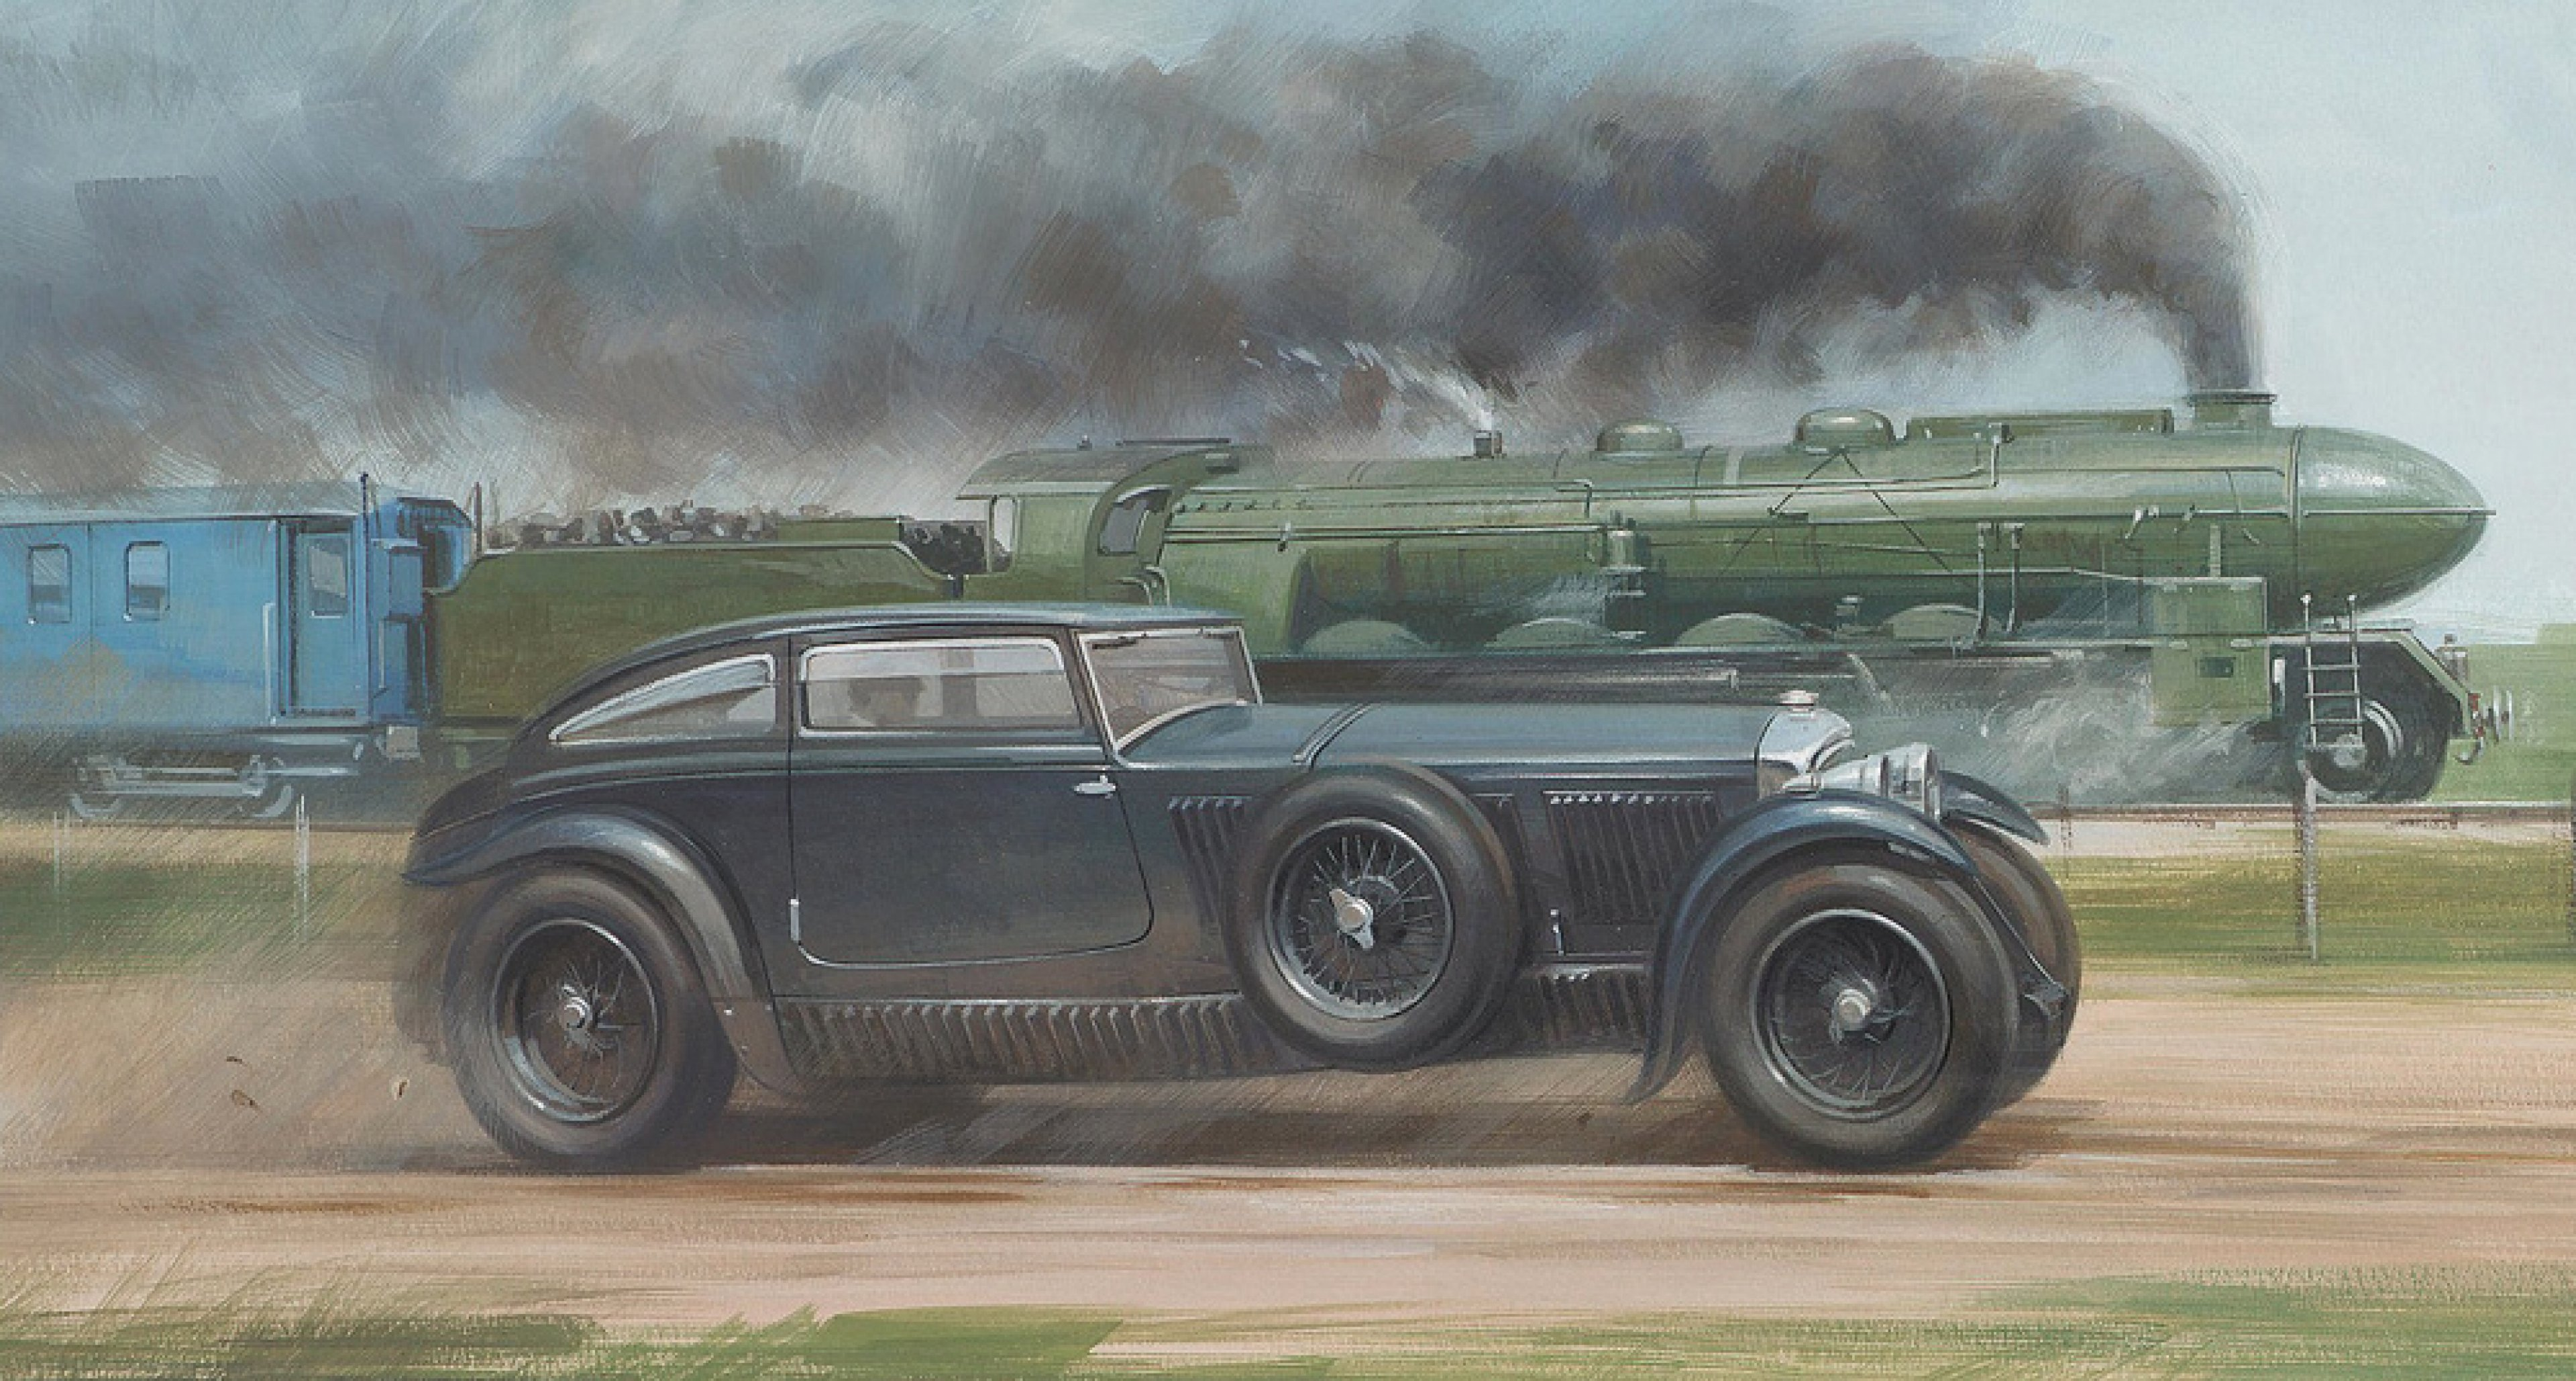 Graham Turner, 'Blue Train Bentley versus Le Train Bleu,'. Auctioned by Bonhams in 2004.